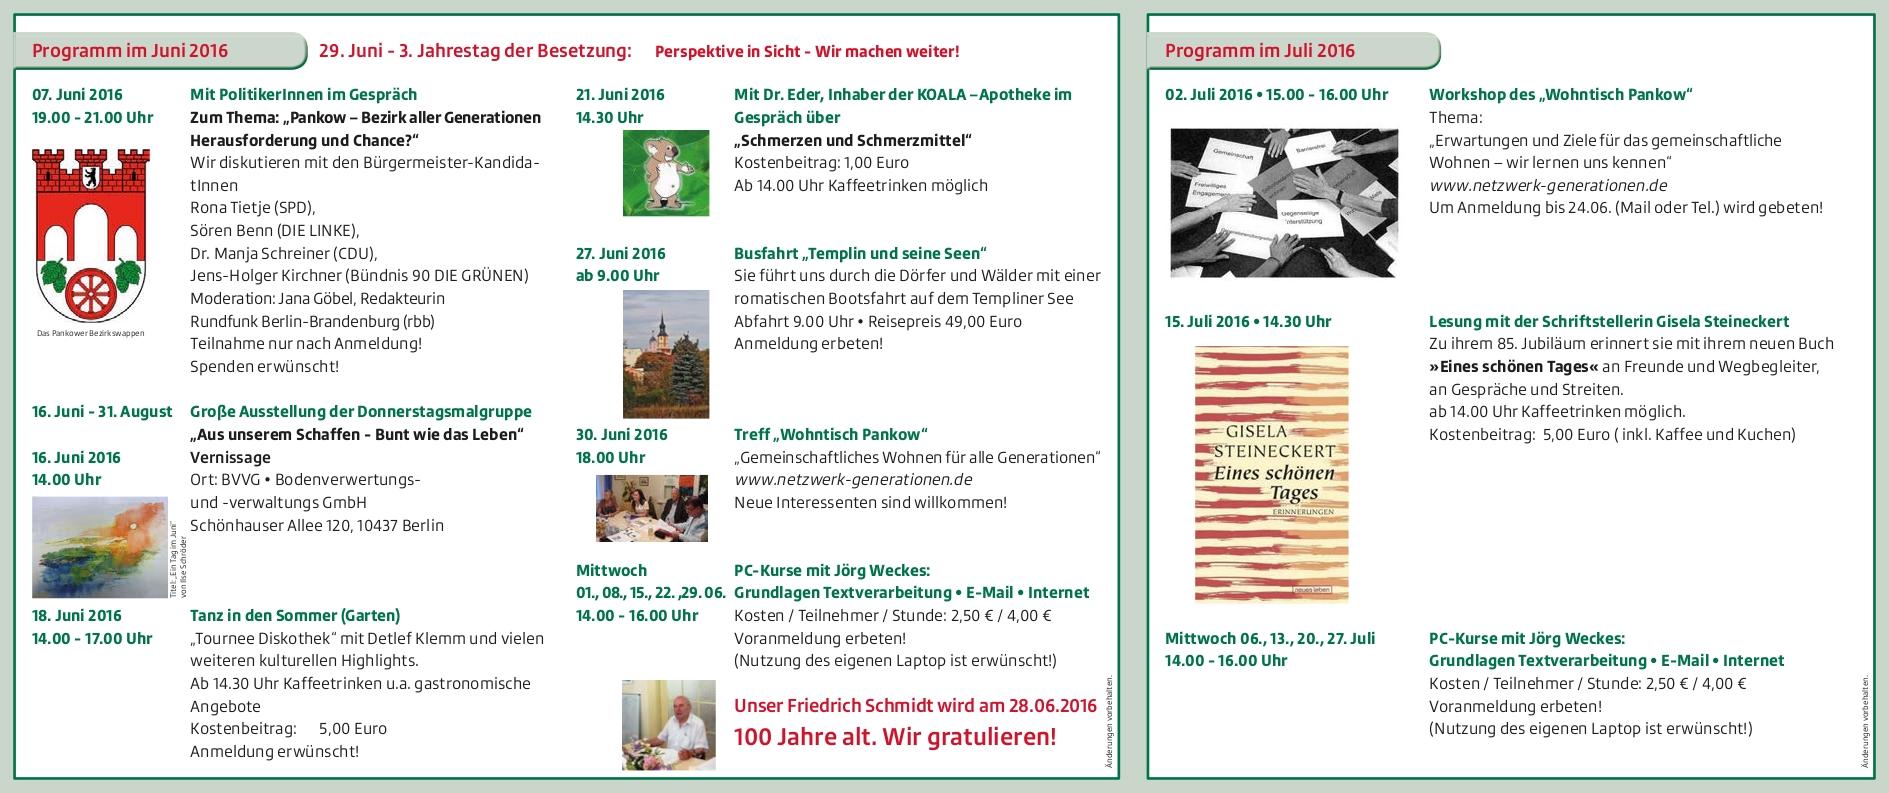 Programm StilleStrasse_Veranst-Juni_Juli 2016_002